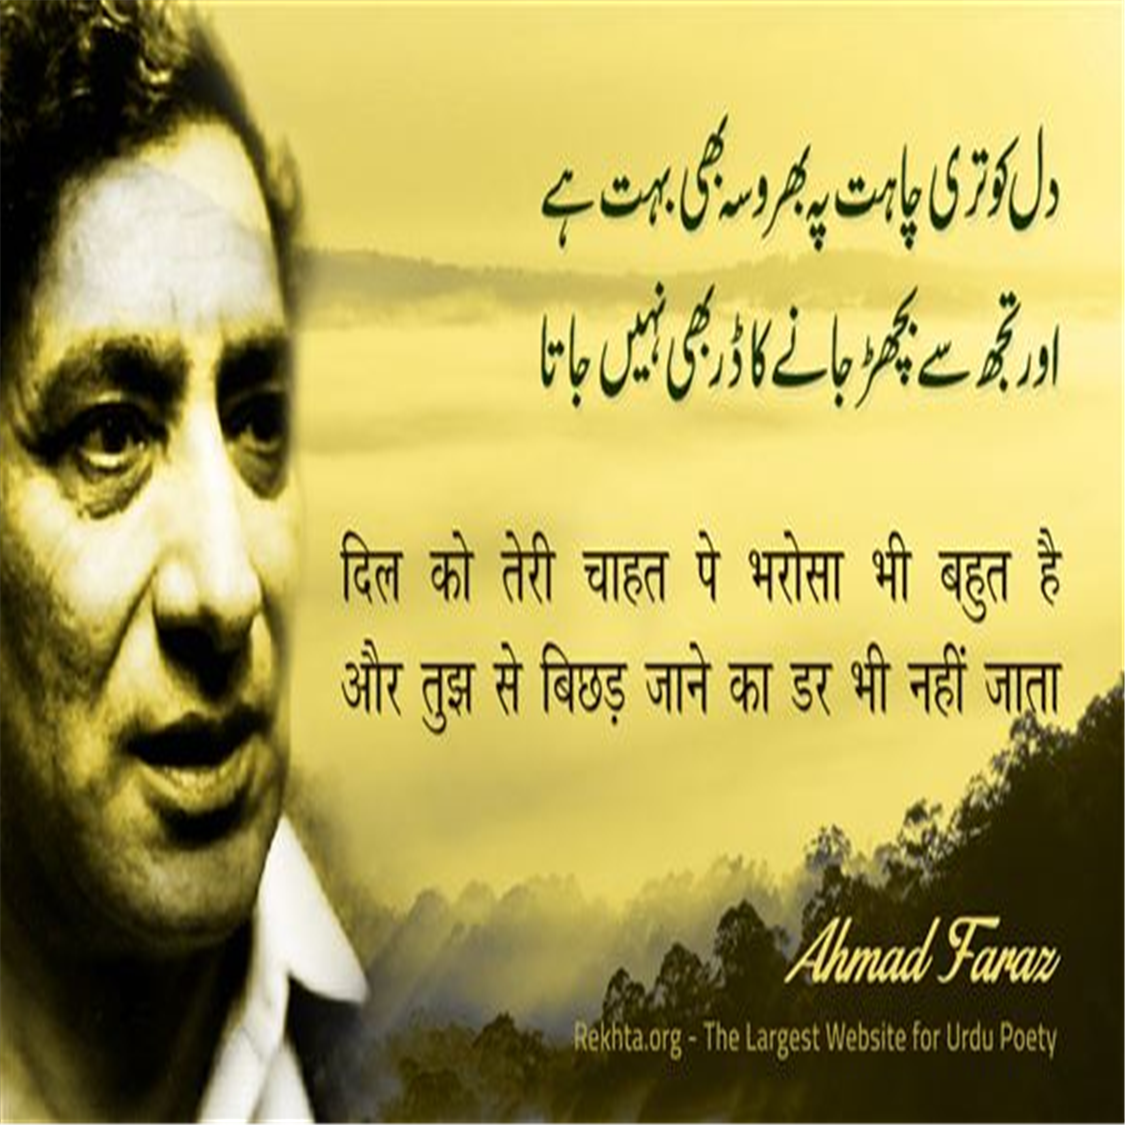 dil ko tirii chaahat pe bharosa bhii bahut hai-Ahmad Faraz